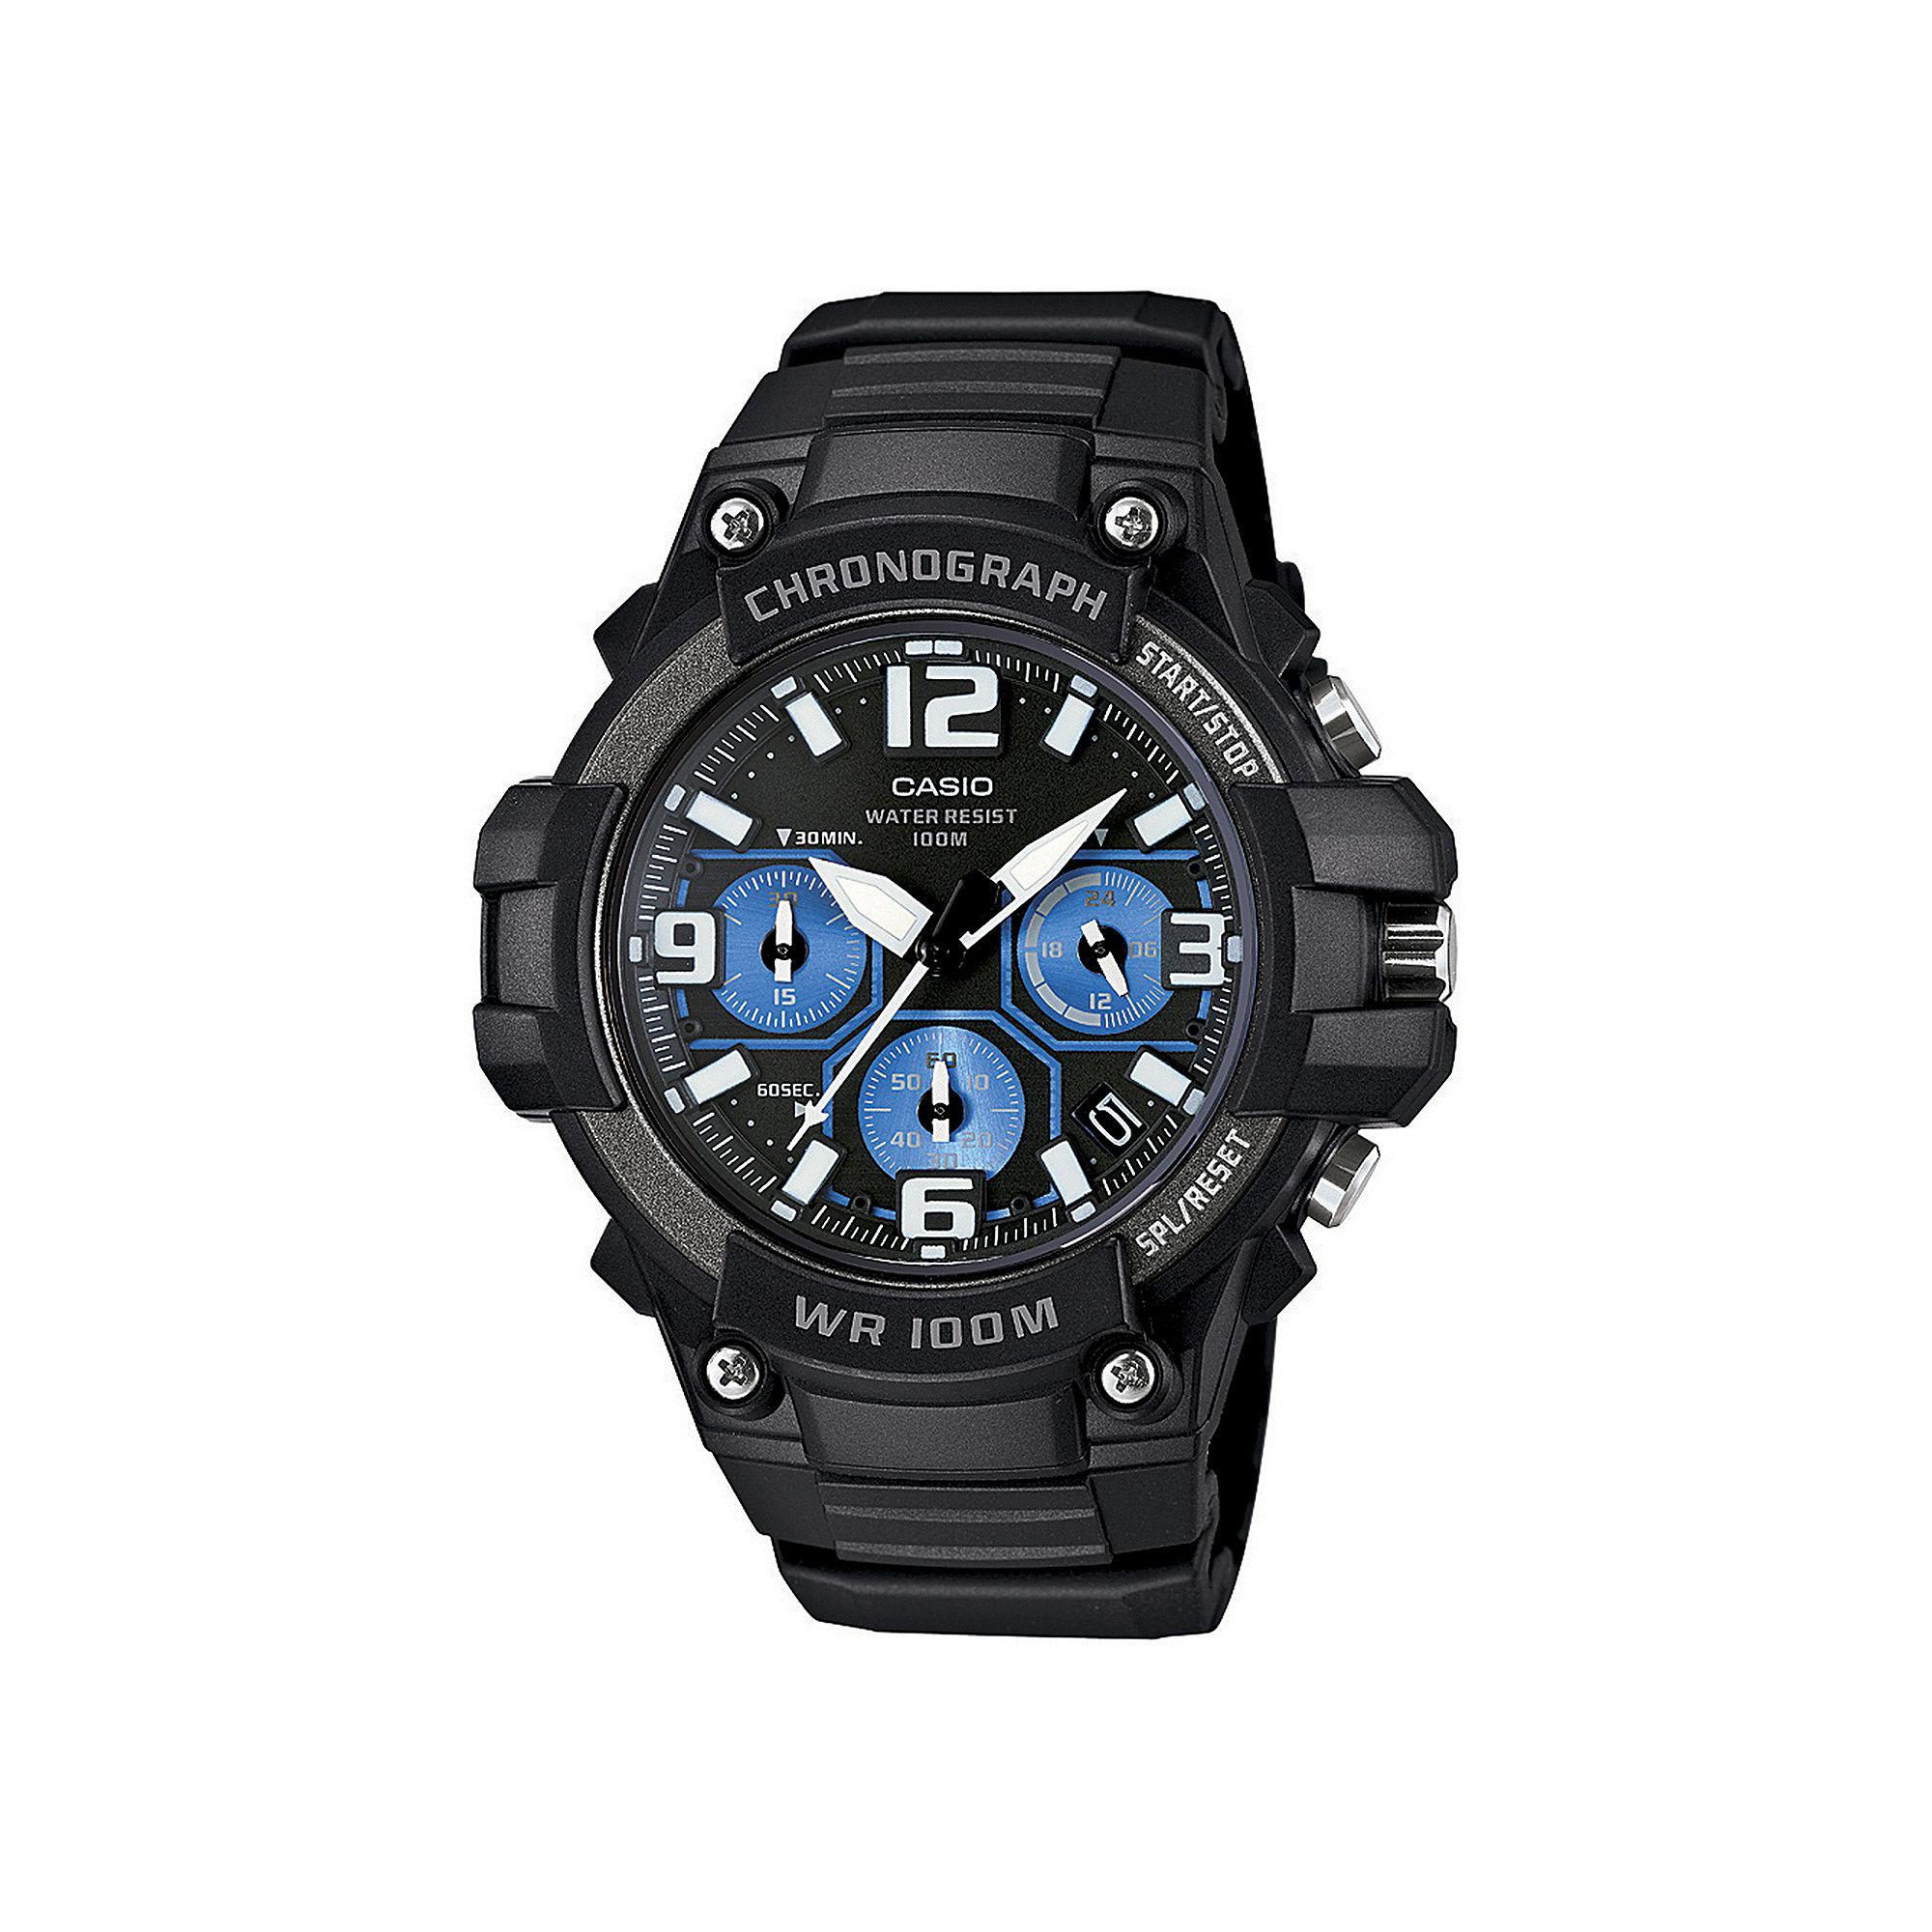 Casio Mens Black Resin Strap Chronograph Watch MCW100-1A2V